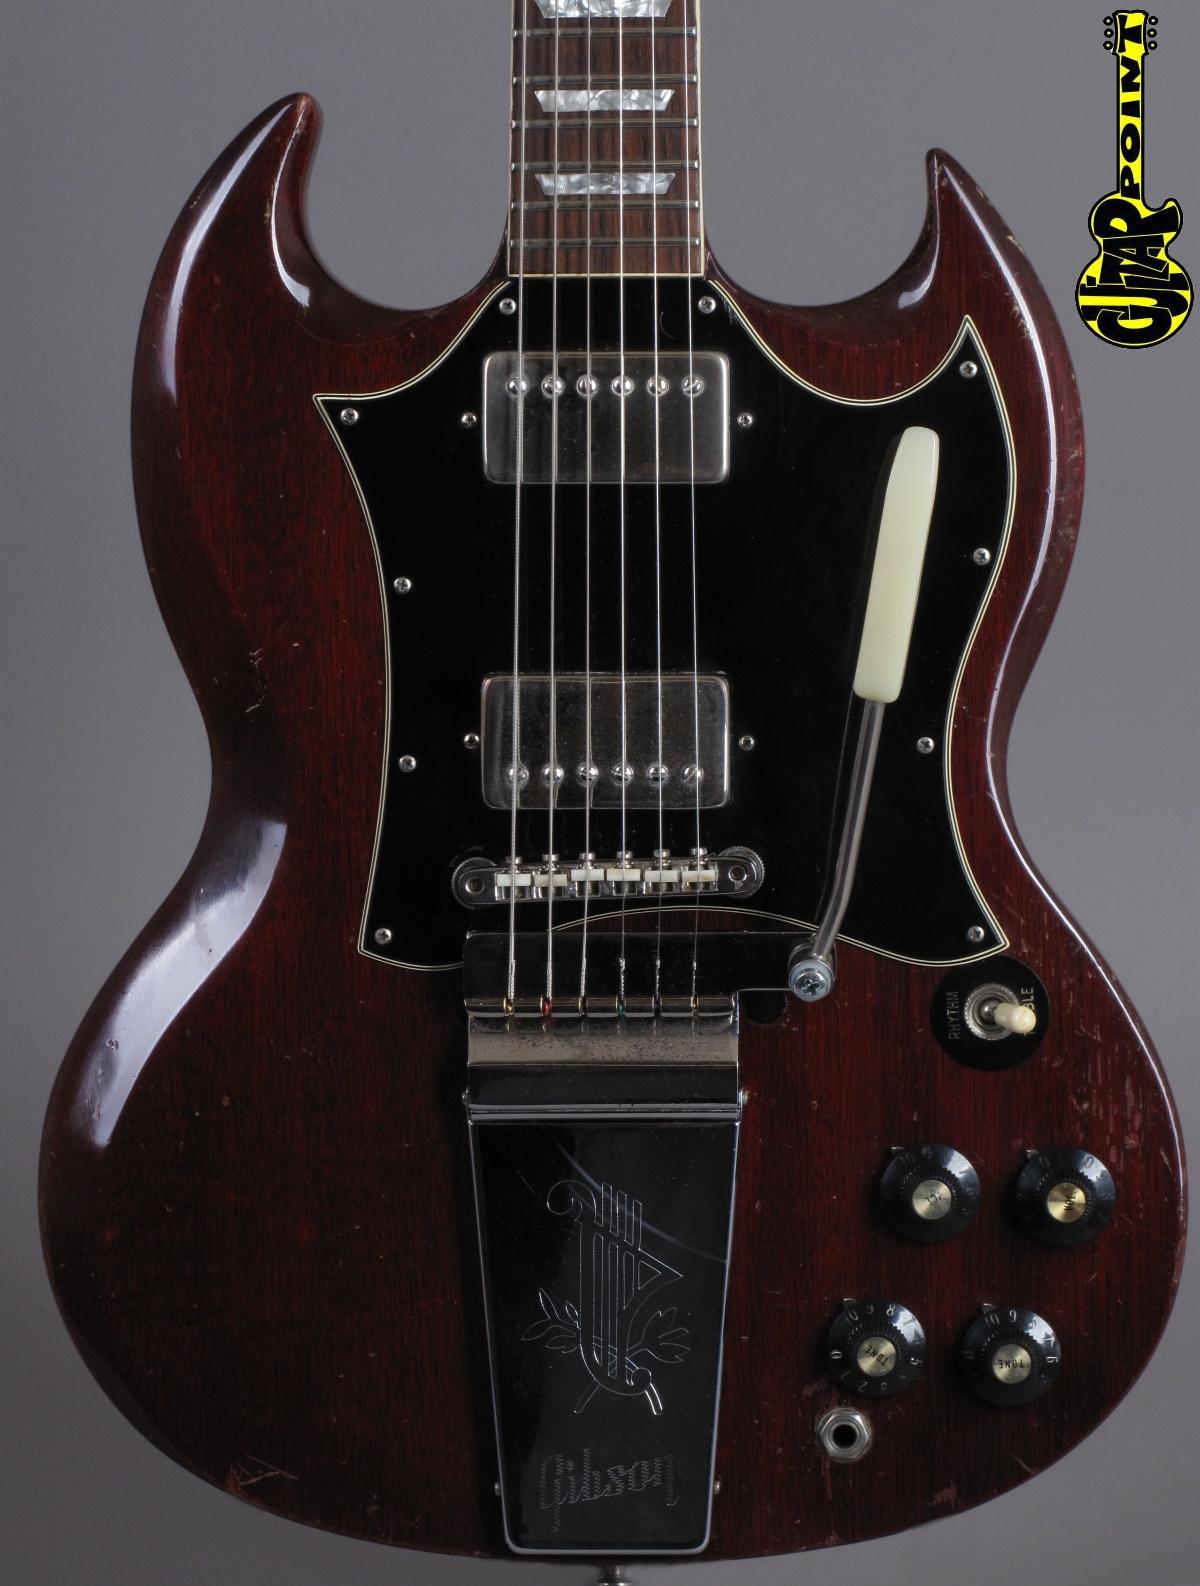 1969 Gibson SG Standard - Cherry